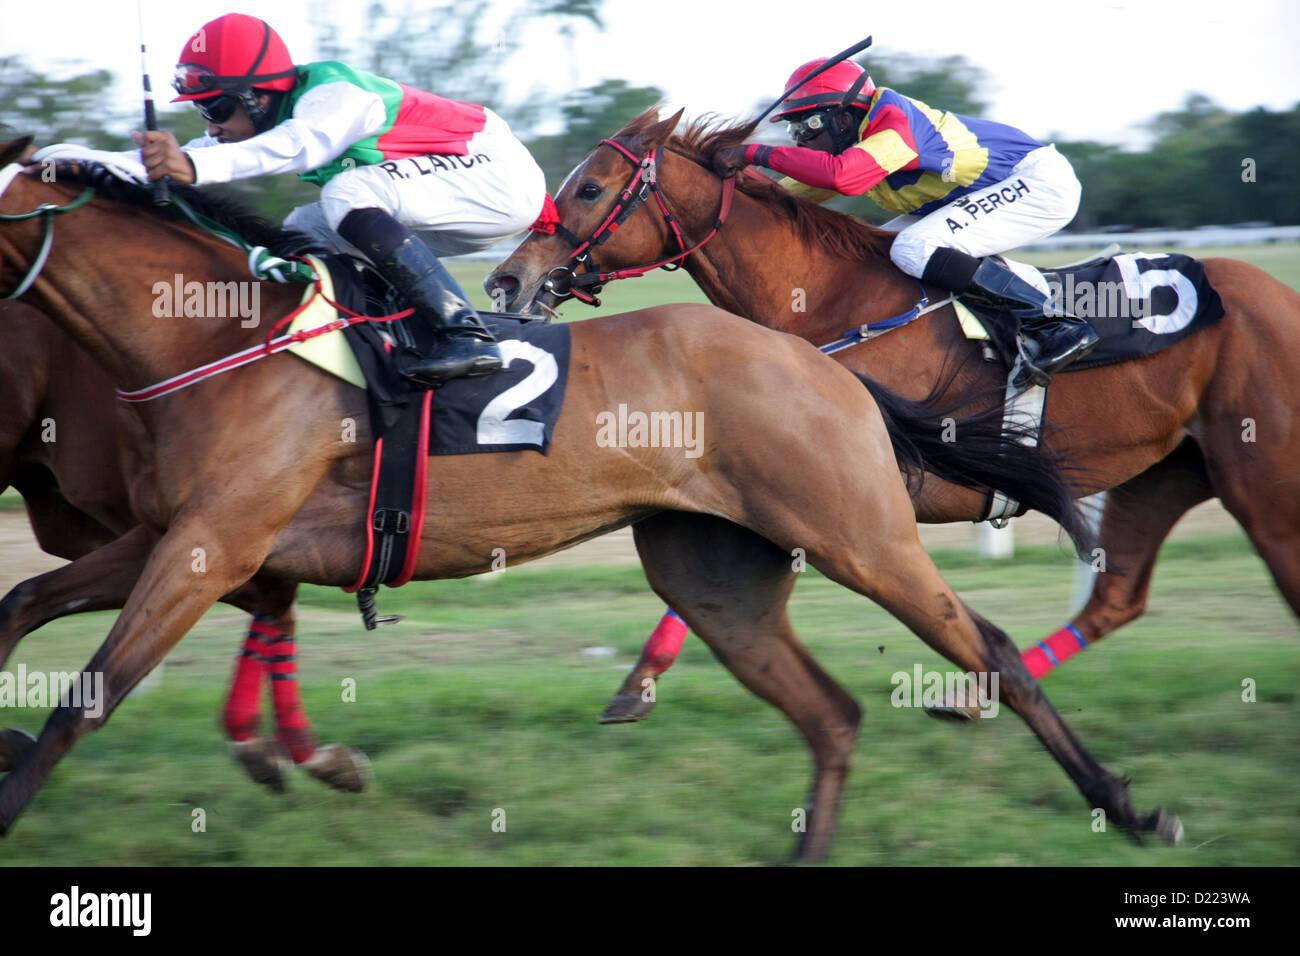 Horse Racing al Savannah Racecourse, Bridgetown, Barbados Immagini Stock